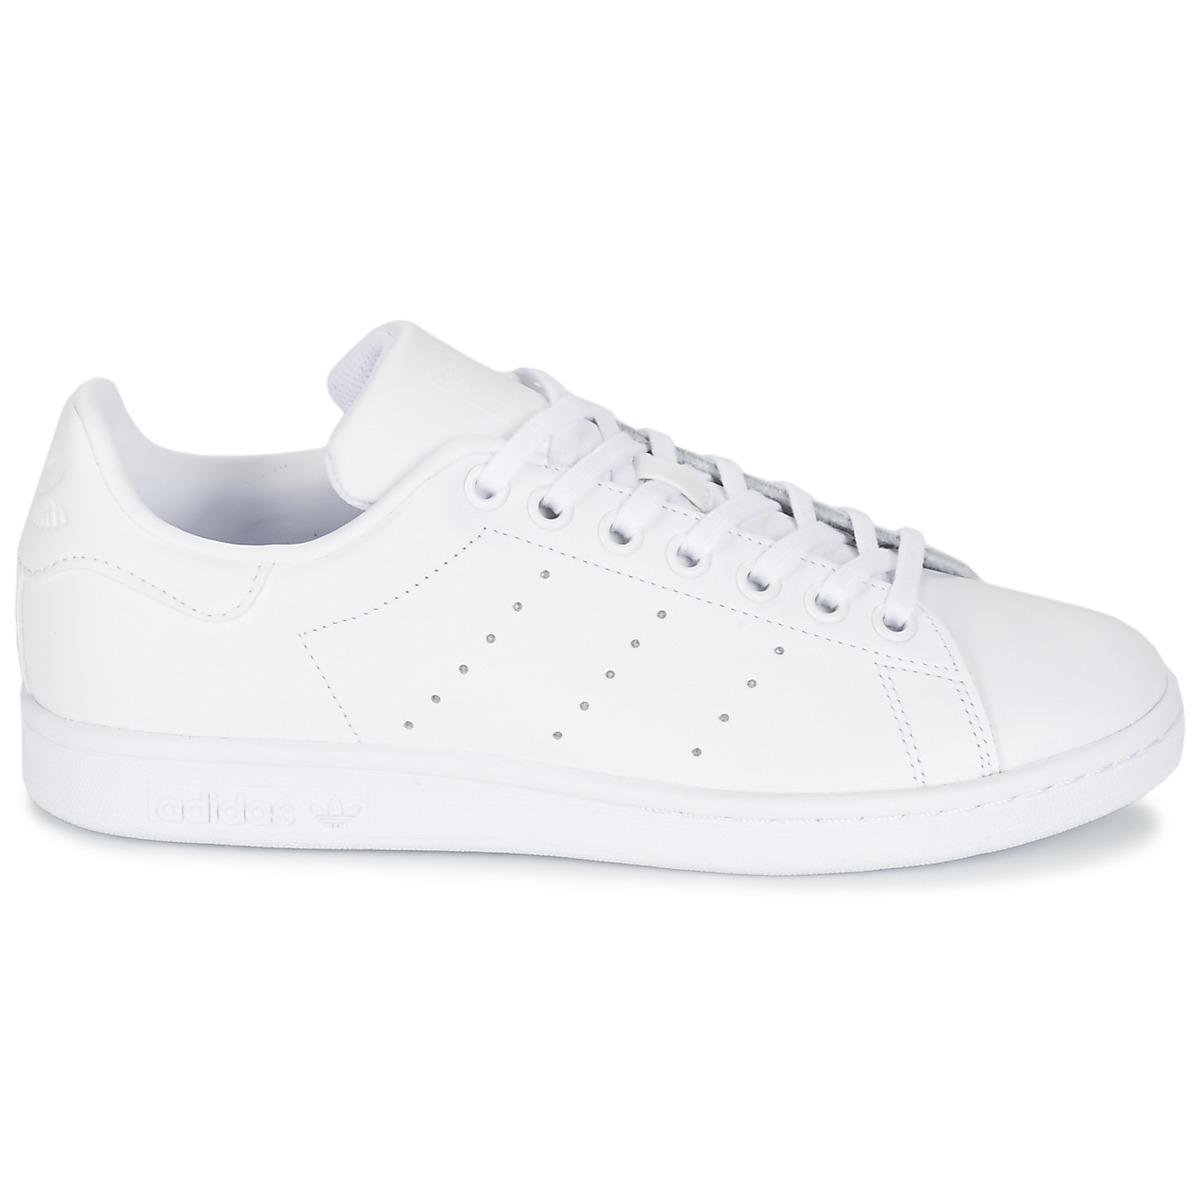 Damen Adidas Schuhe Damen Adidas Weiß Sneaker 0Nmwnyv8O